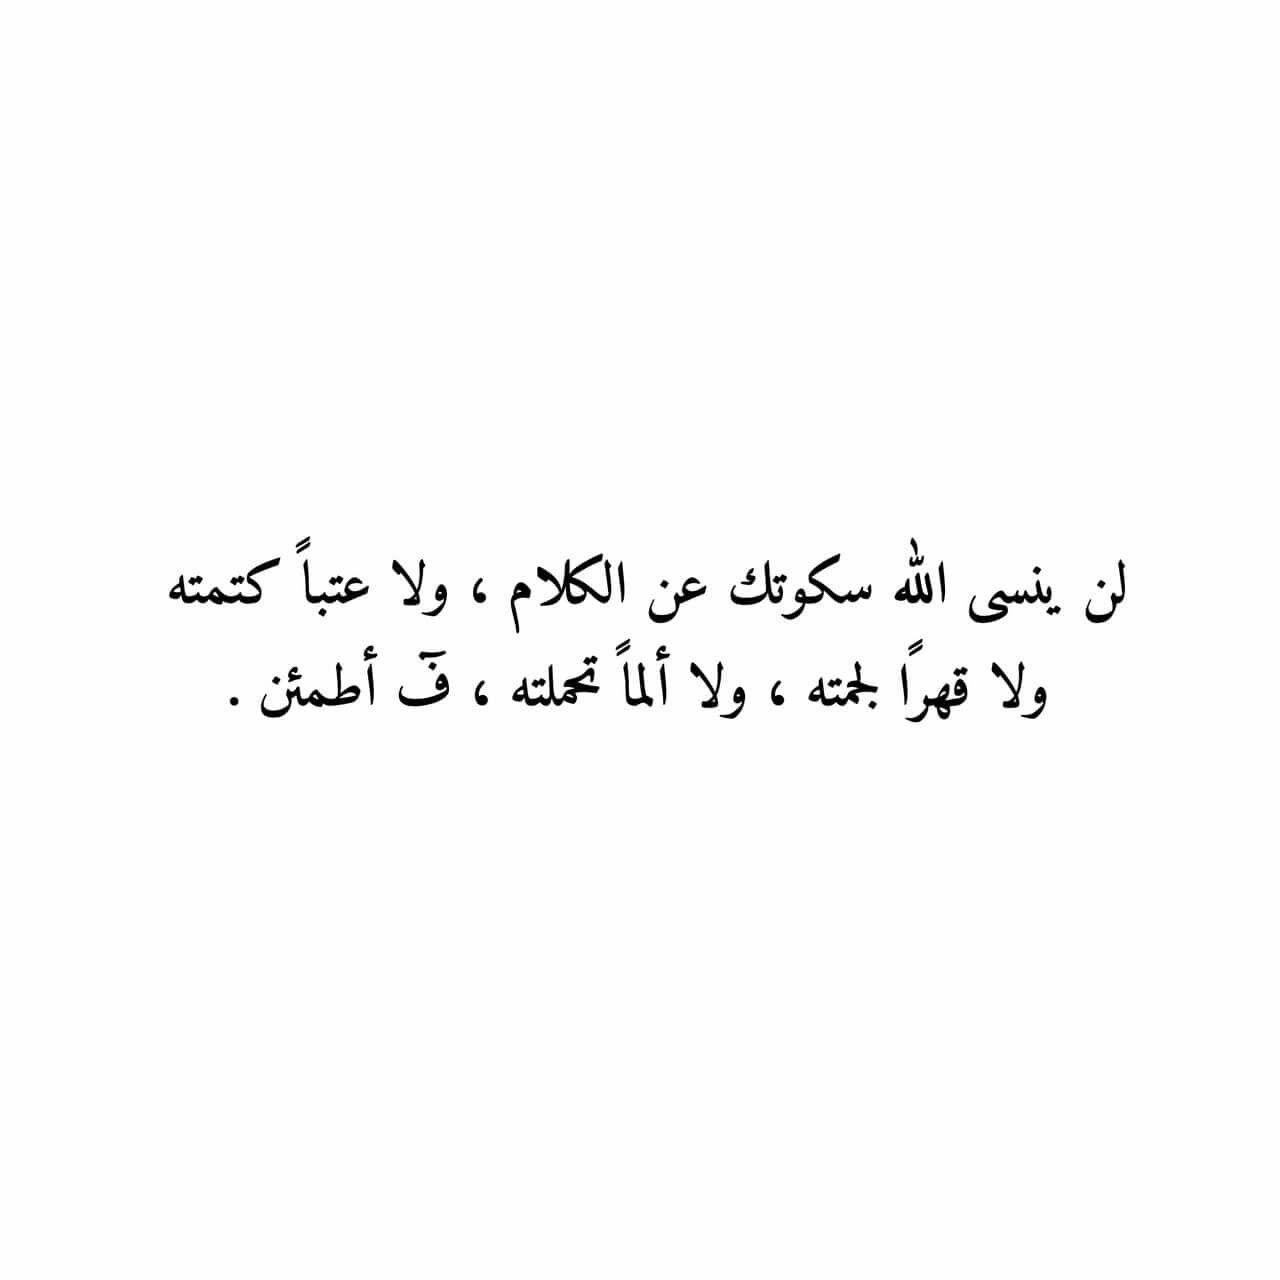 لن ينسى ابدا Words Quotes Its Friday Quotes Quotes To Live By